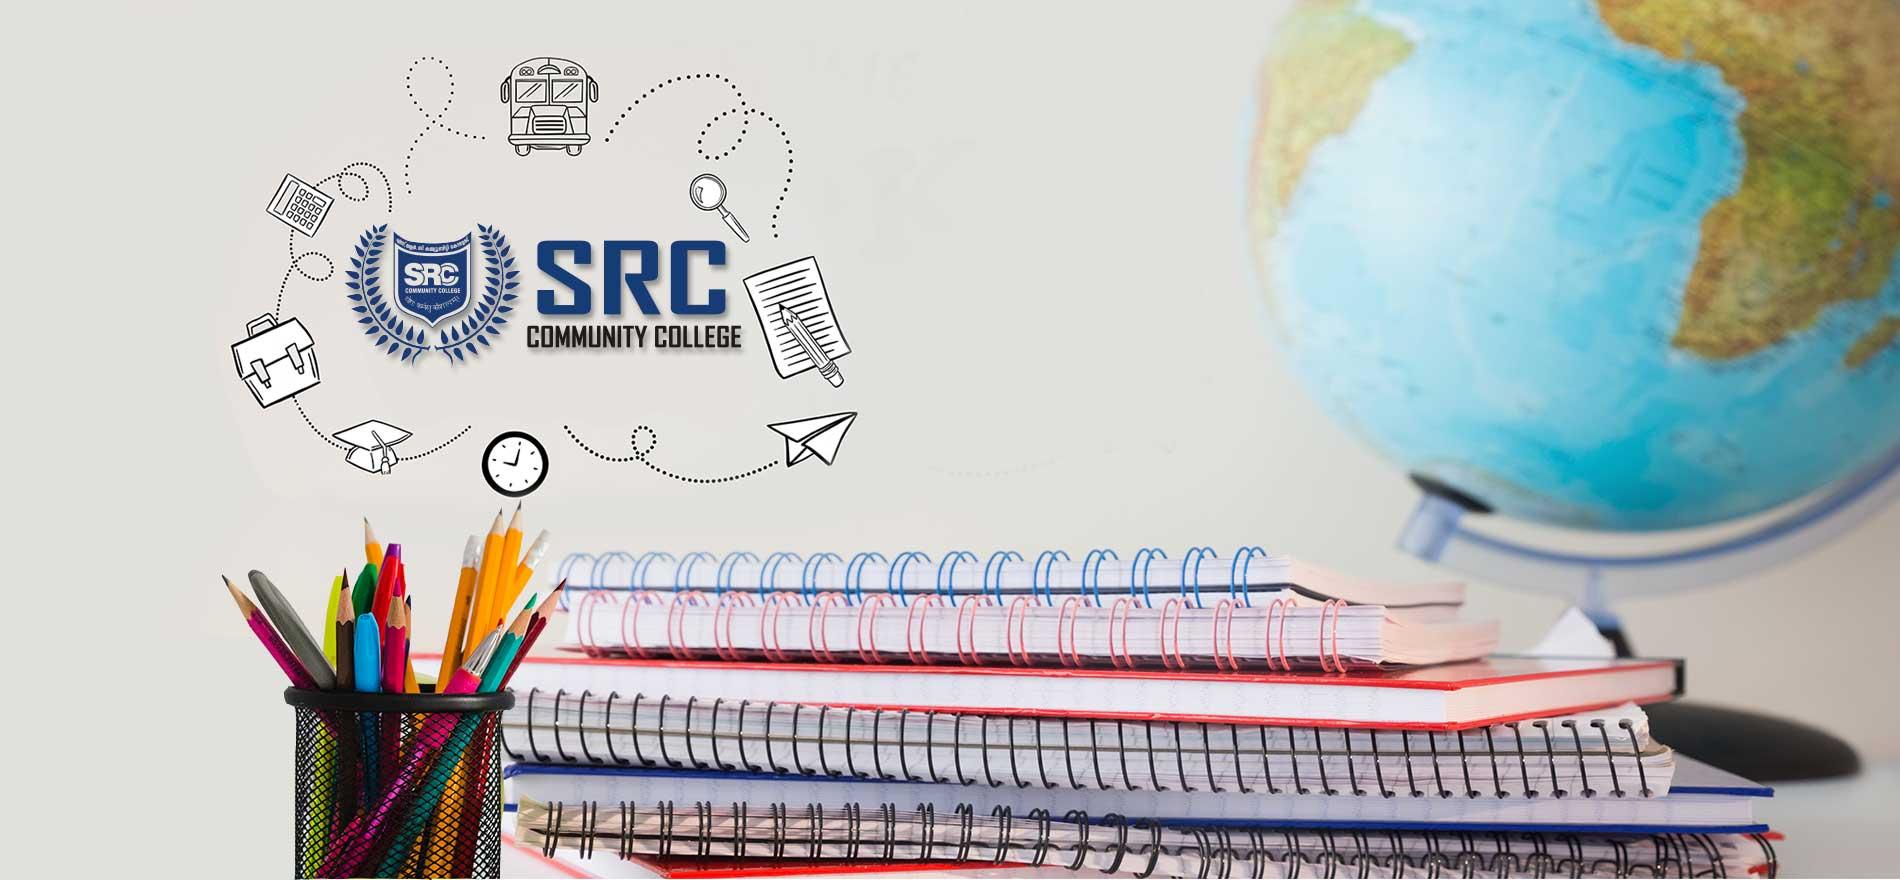 SRC Community College